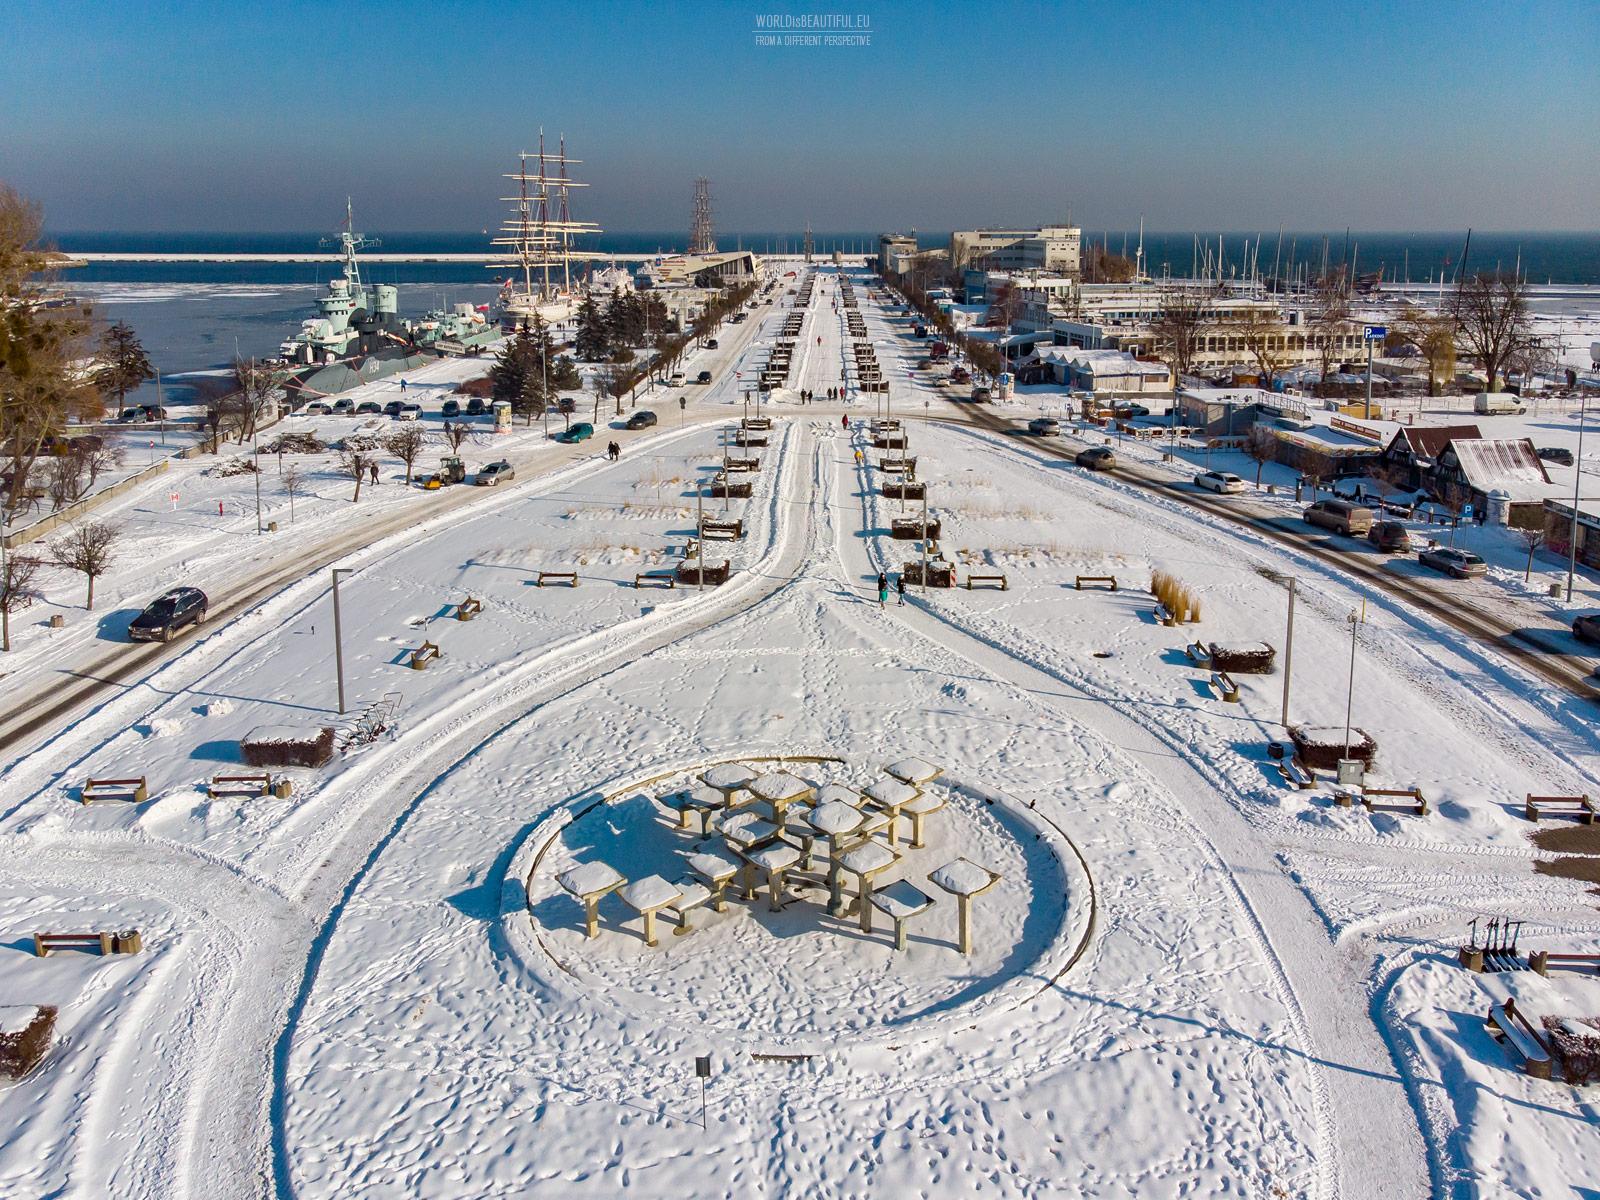 Kościuszko Square in winter